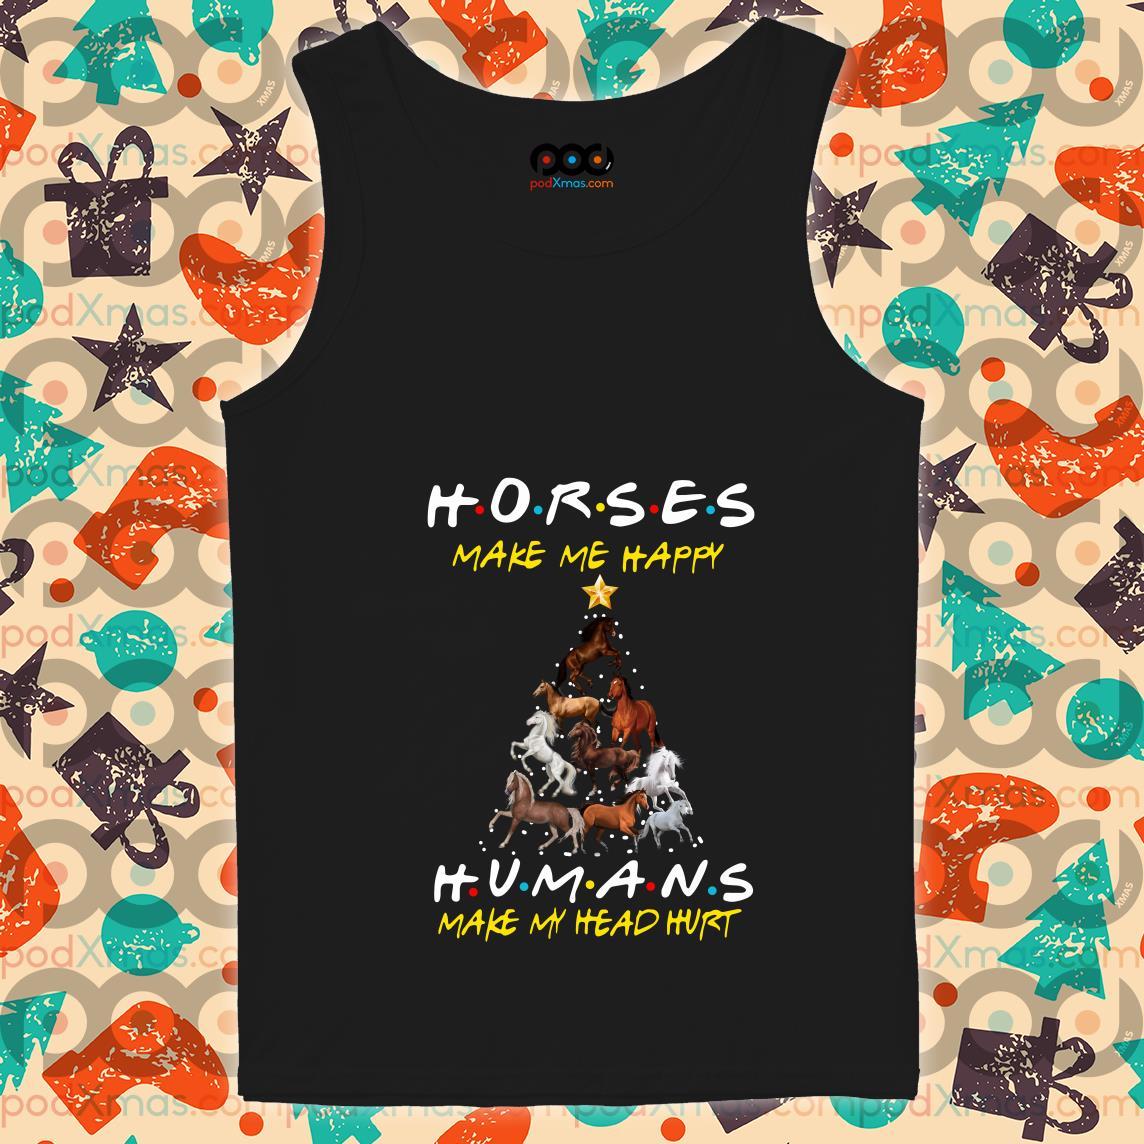 Horses make me happy humans make my head hurt Christmas tank top